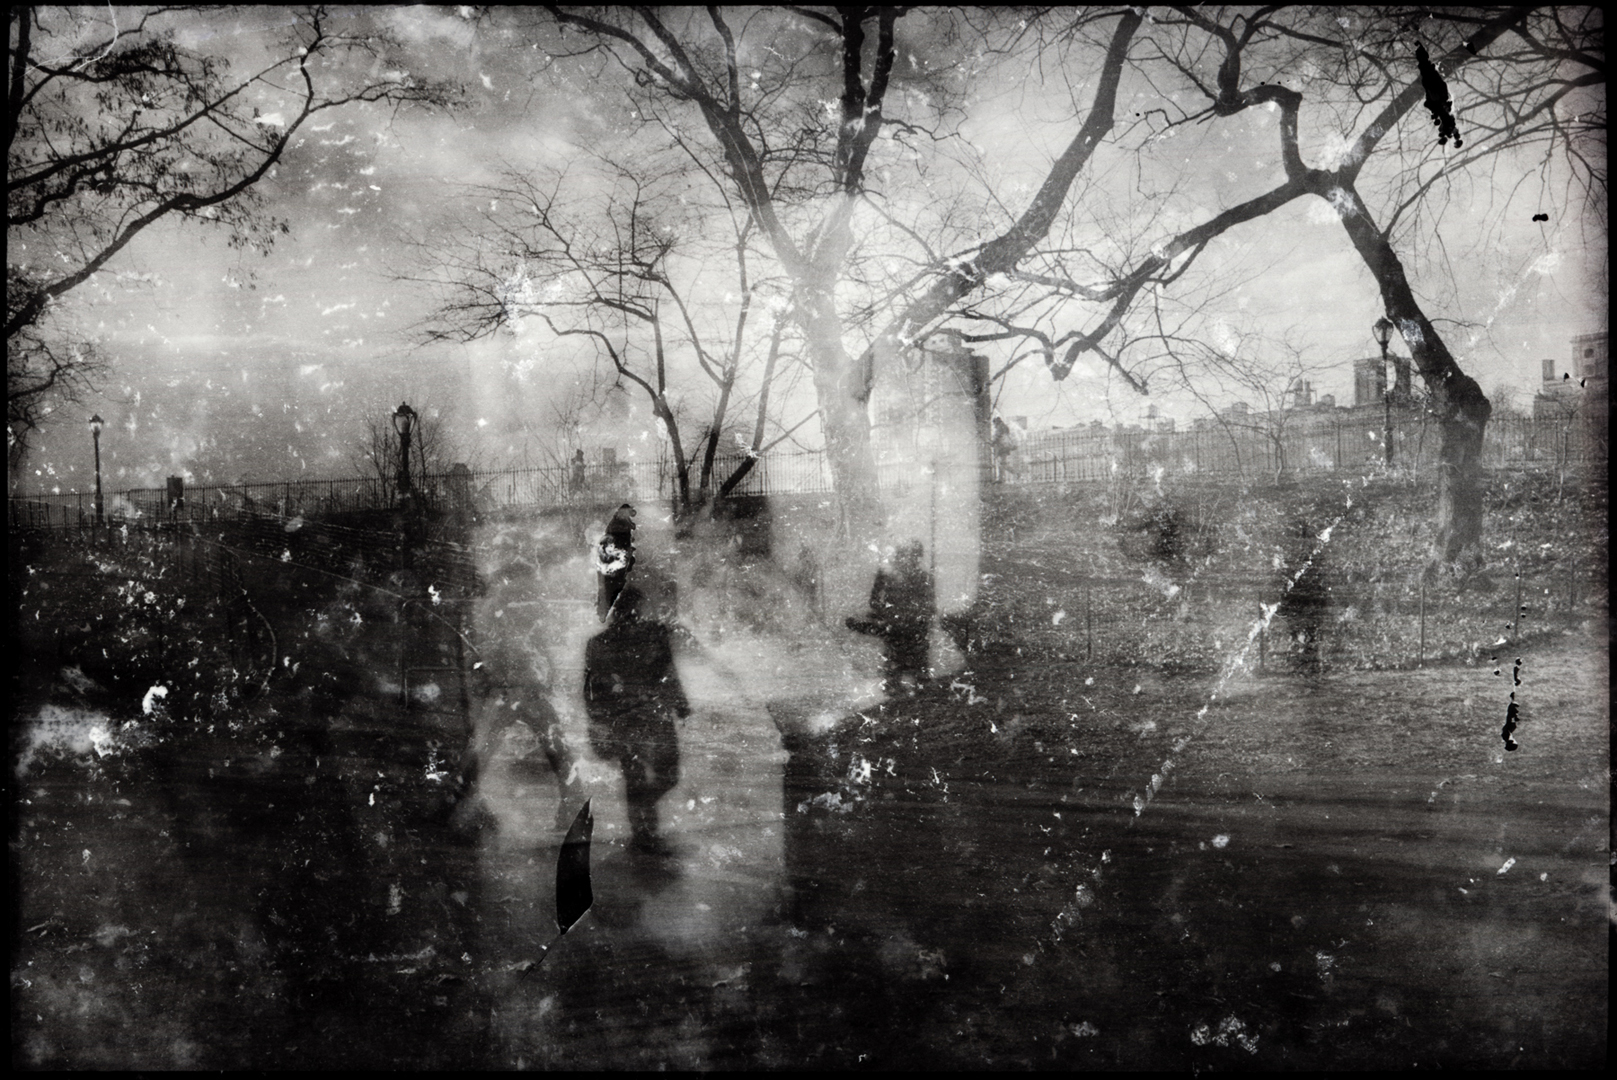 Cynthia Karalla / Photographer